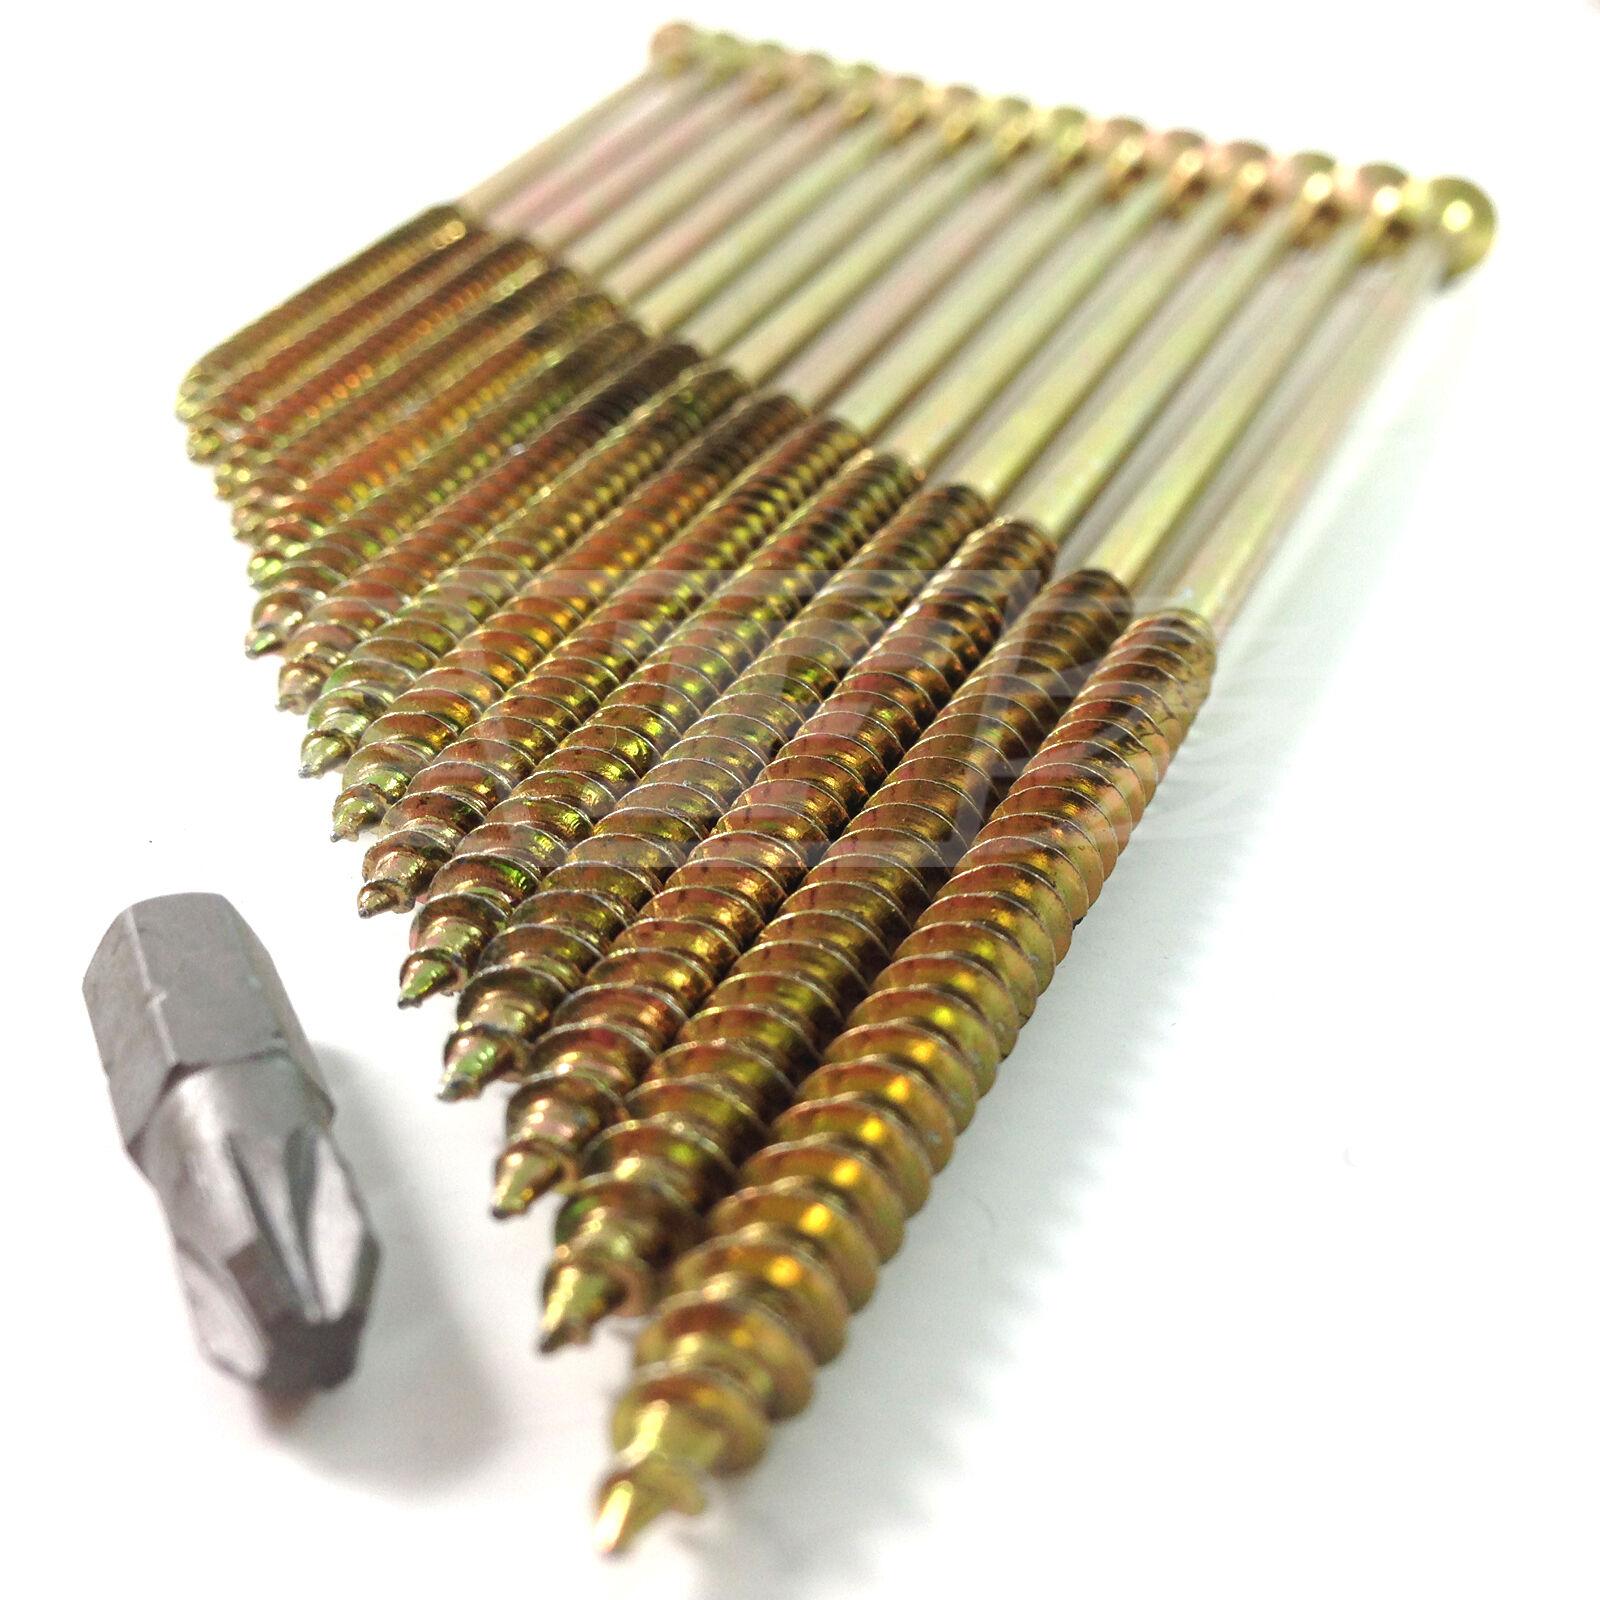 150mm (6 ) 12g TIMCO PROFESSIONAL CLASSIC LONG WOODSCREWS POZI CSK GASH POINT